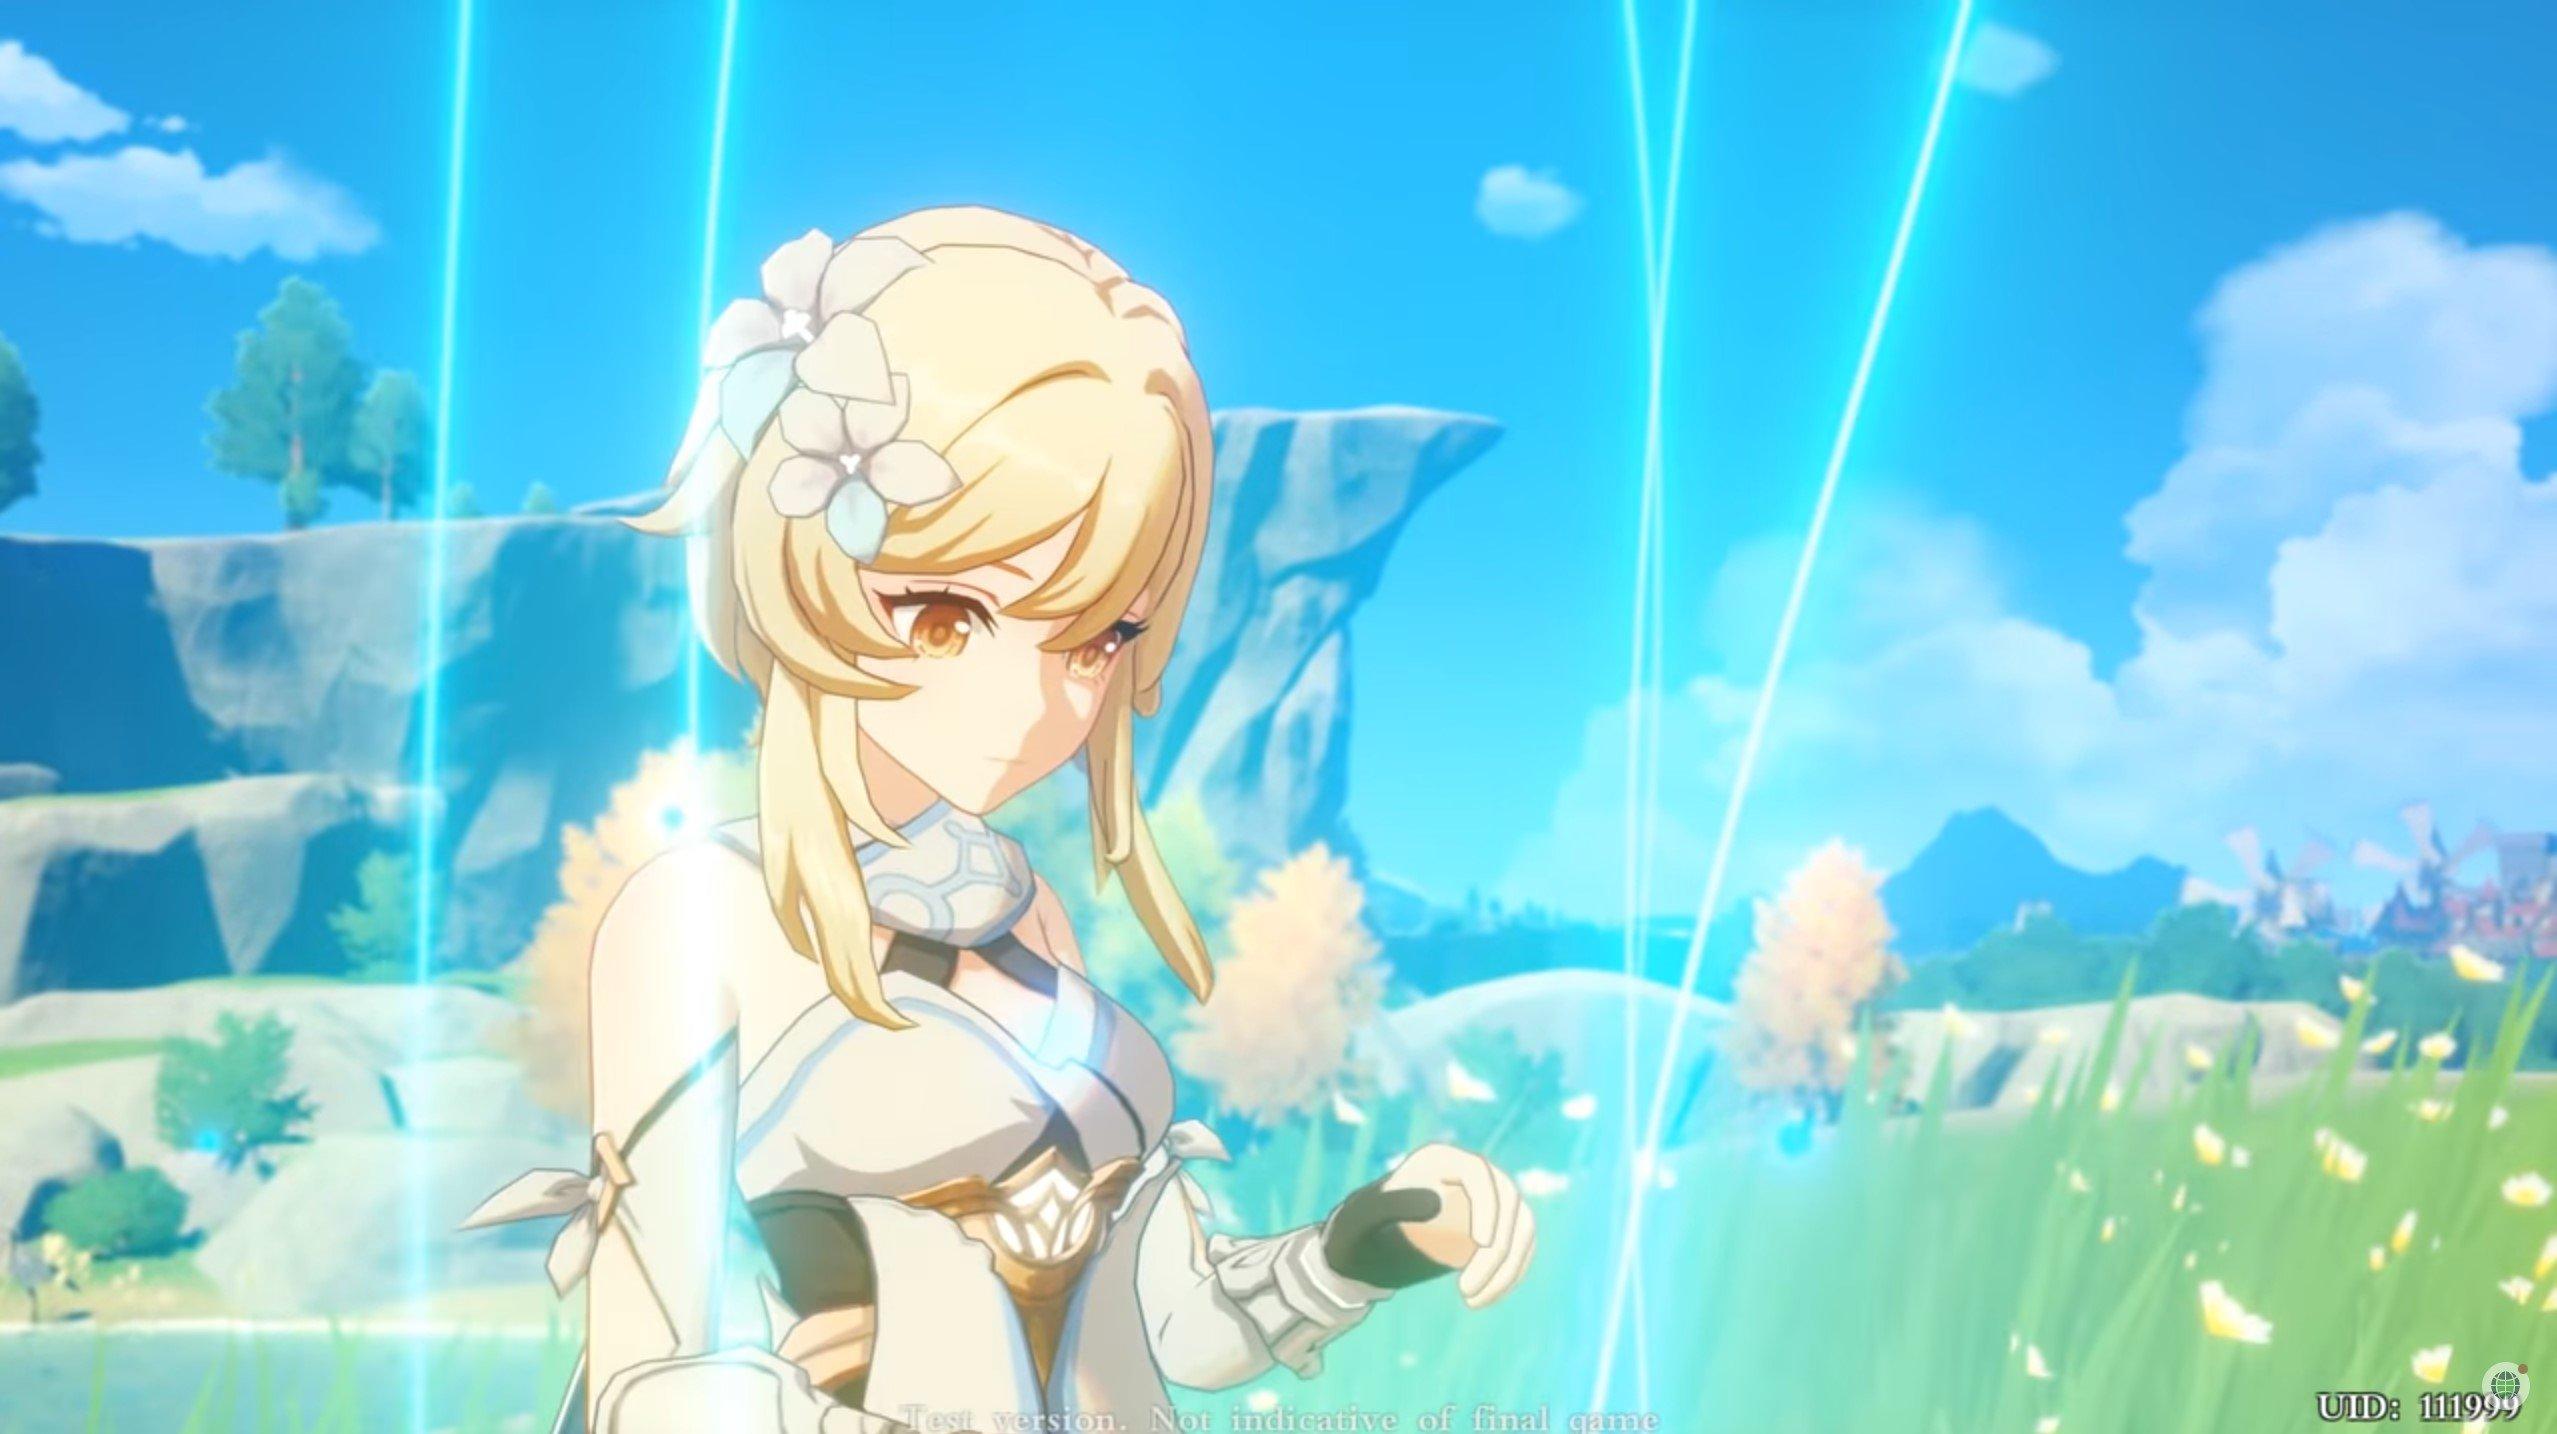 Genshin Impact Ketika Anime Dan The Legends Of Zelda Breath Of The Wild Bertemu Gamebrott Com